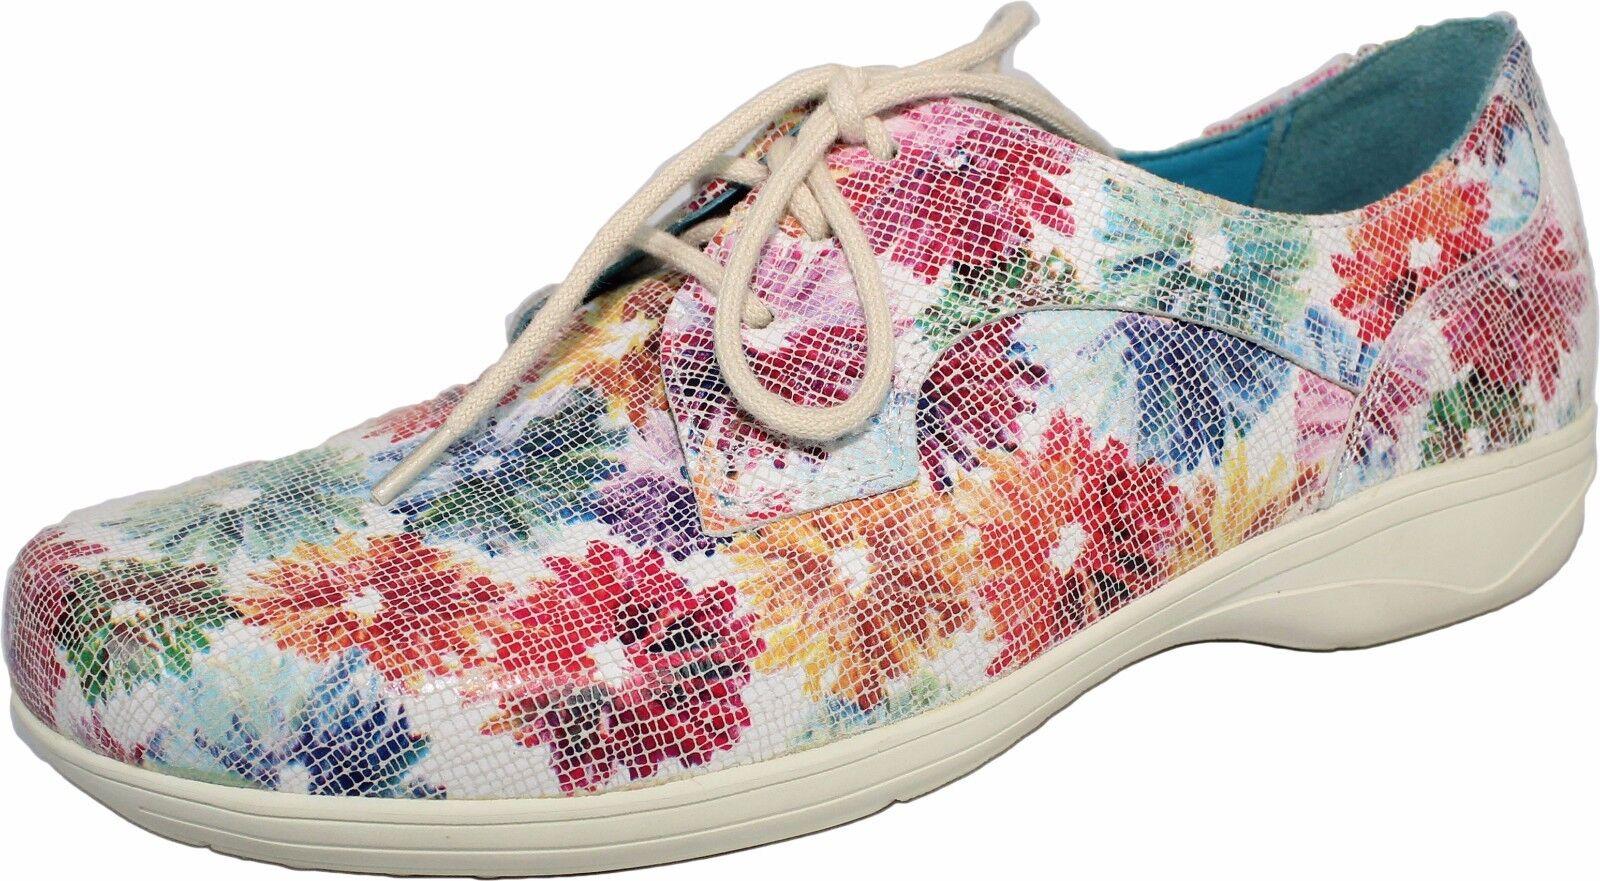 ORSO SCARPA Fleurette TGL Sneaker donna TGL Fleurette 37 Fiori 24b328